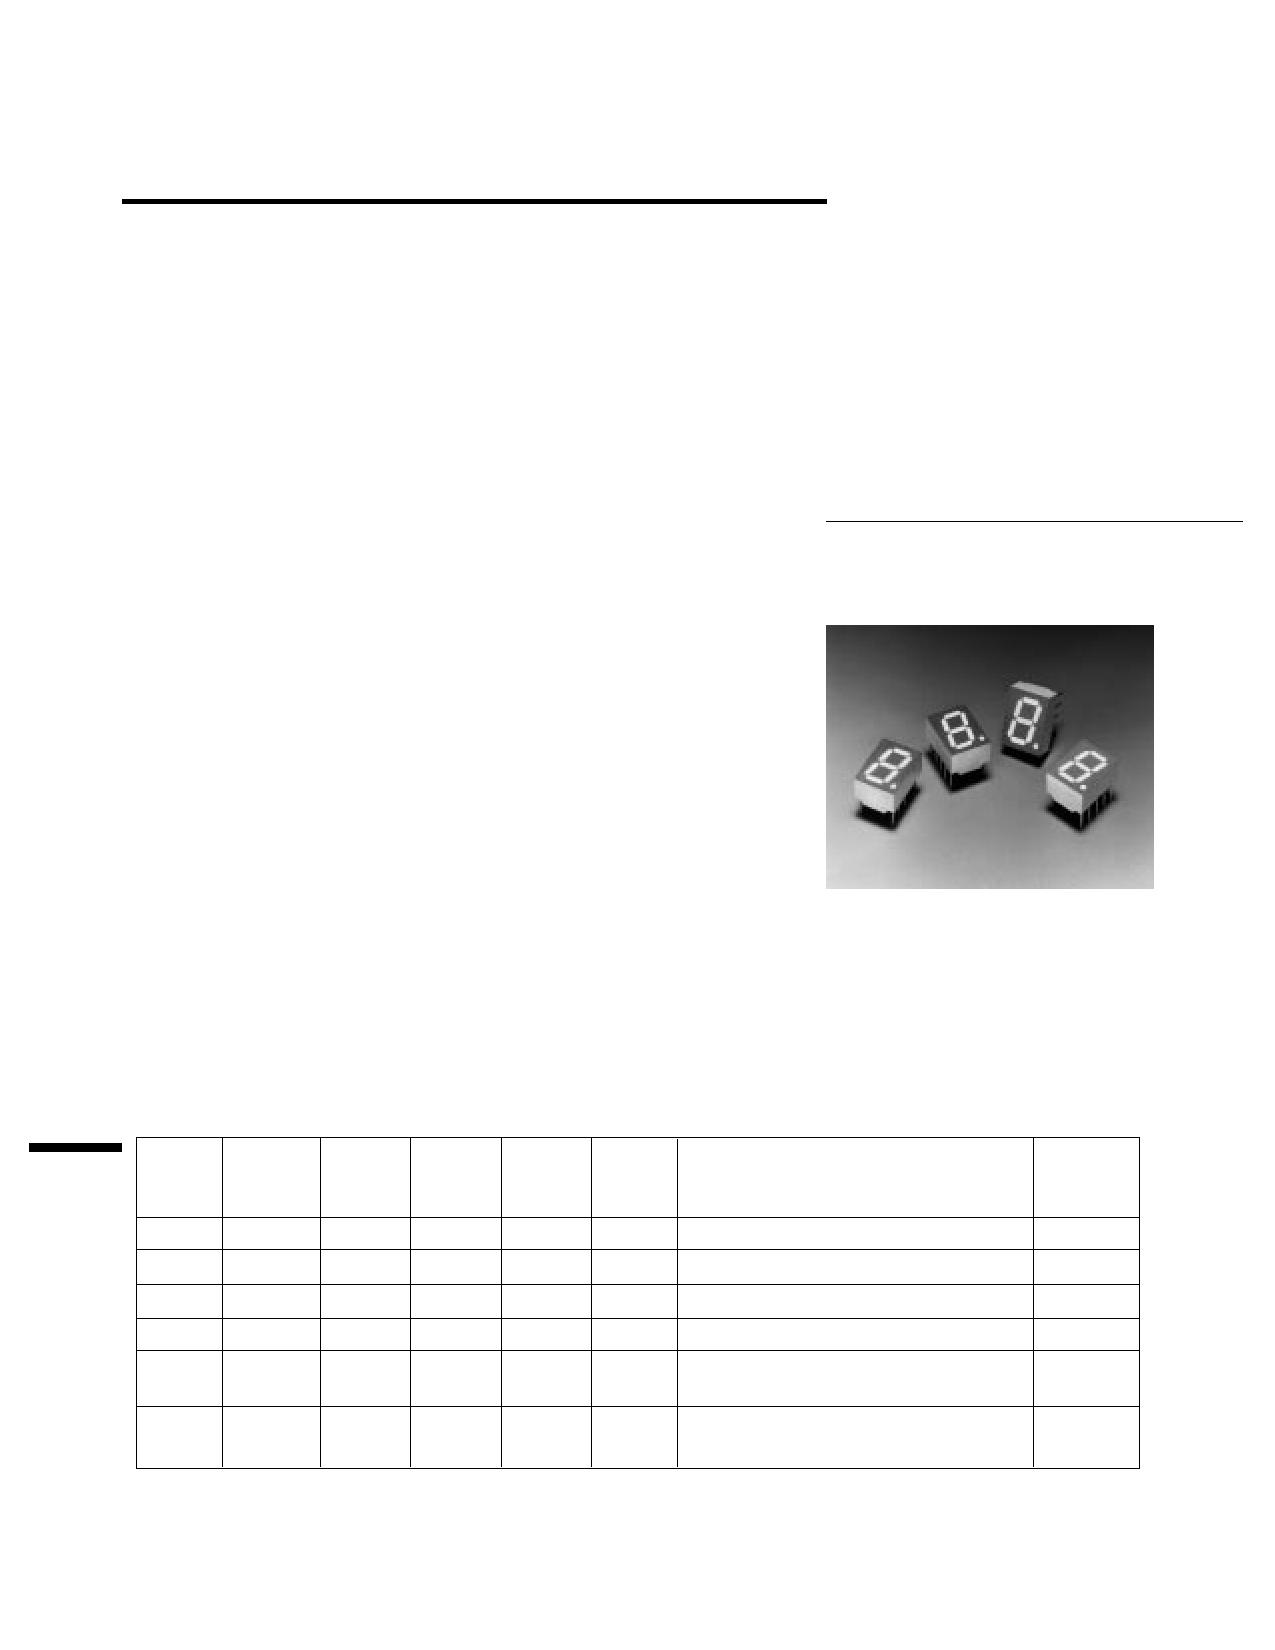 HDSP-G401 دیتاشیت PDF